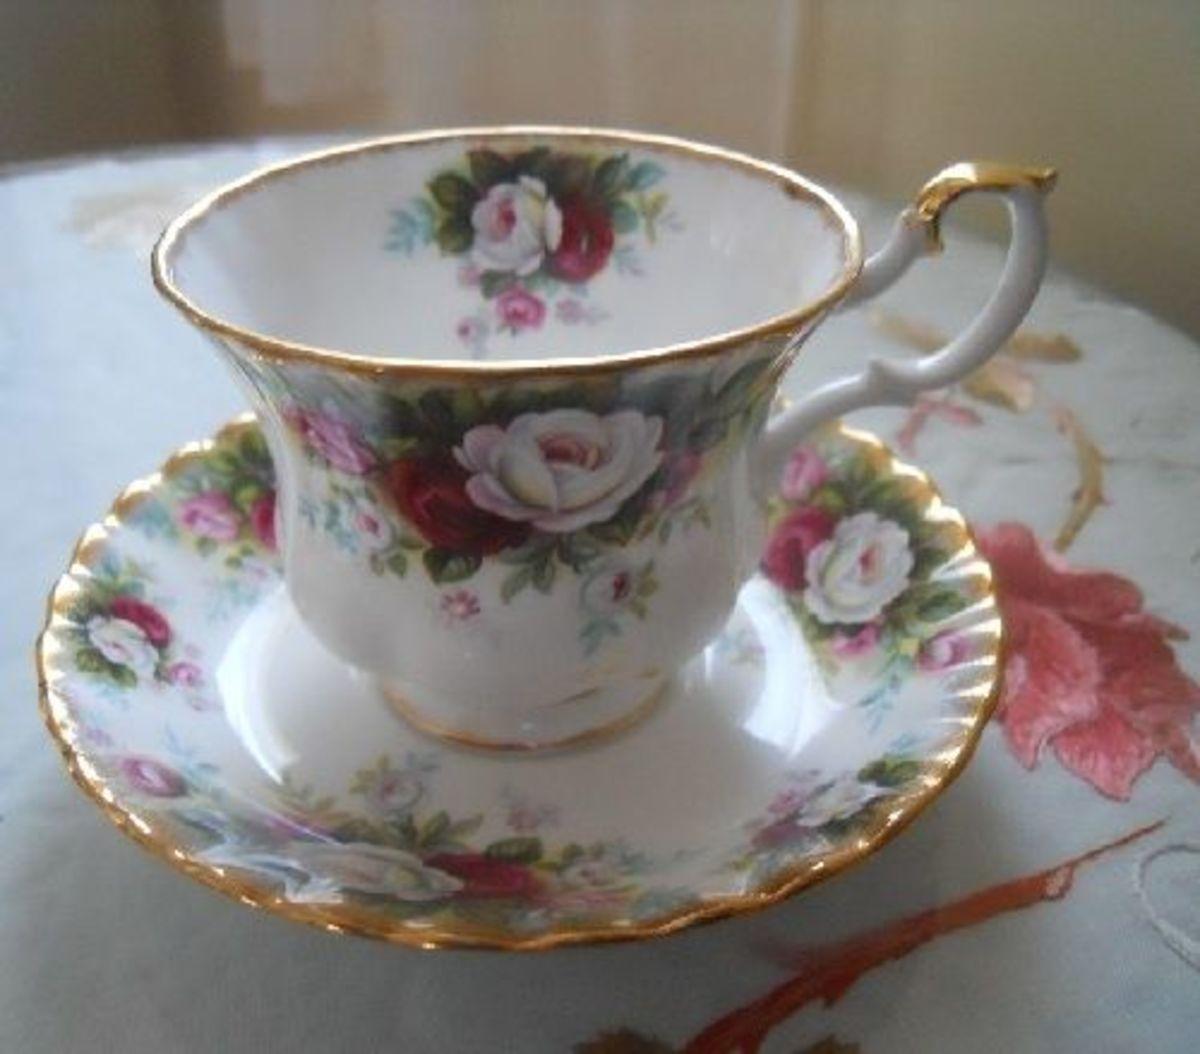 Royal-Albert-Celebration-teacup